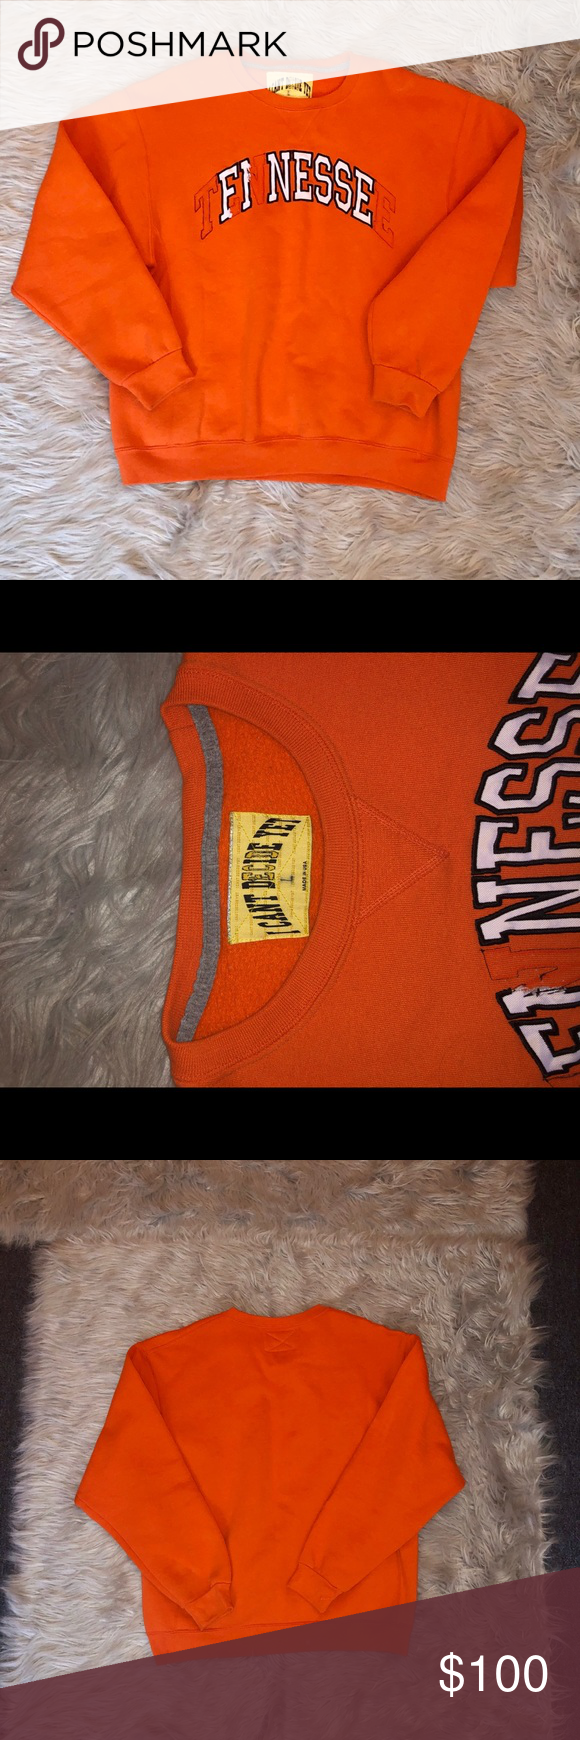 Tennessee Finesse Crewneck Sweatshirt Tops Sweatshirts Hoodie Sweatshirts [ 1740 x 580 Pixel ]